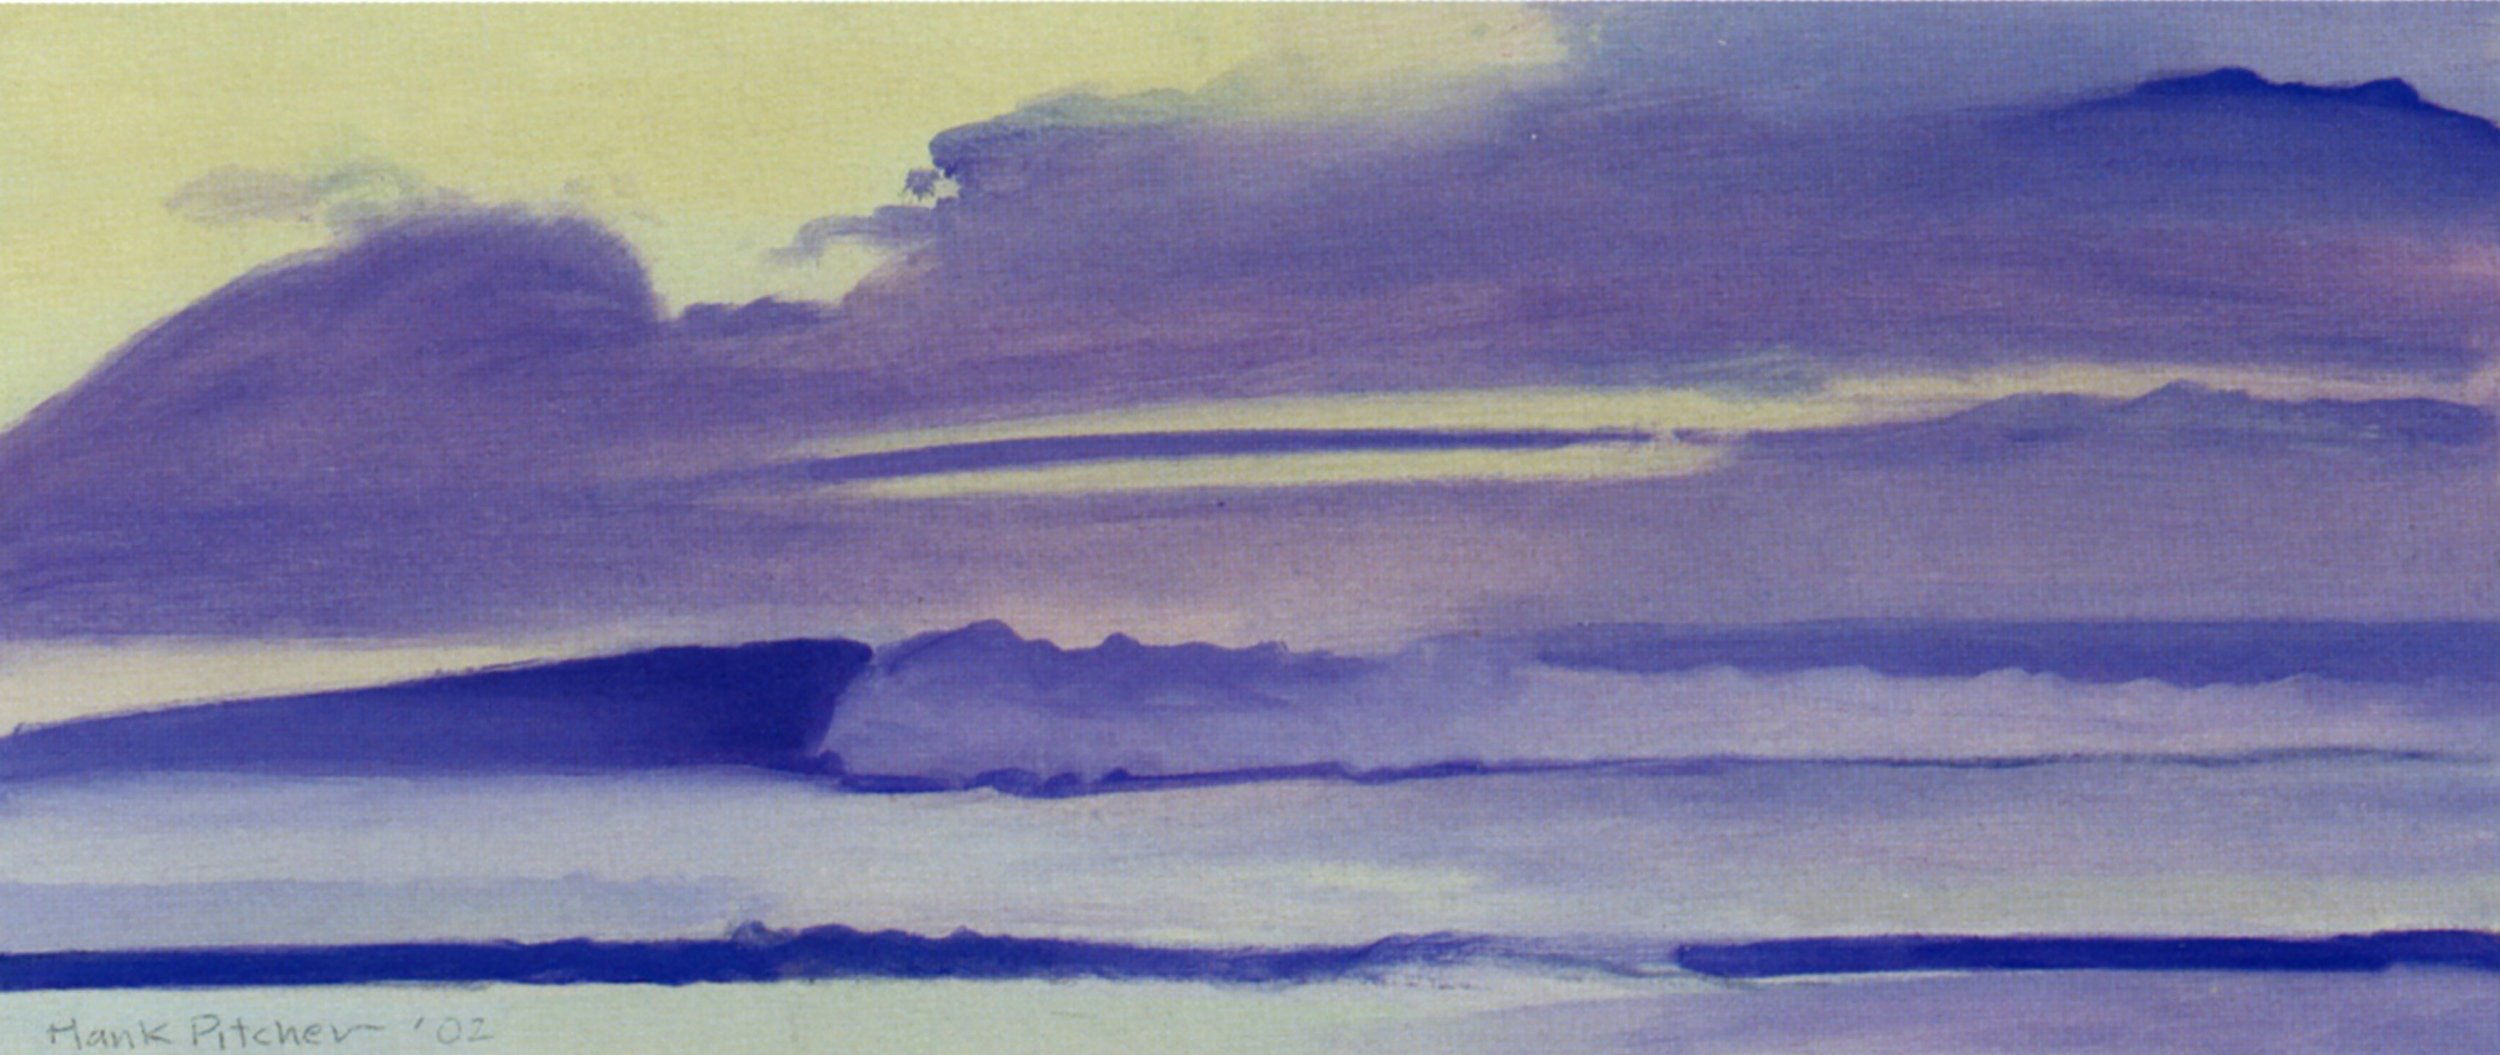 Hank PITCHER   Big Wave at Dawn   2004